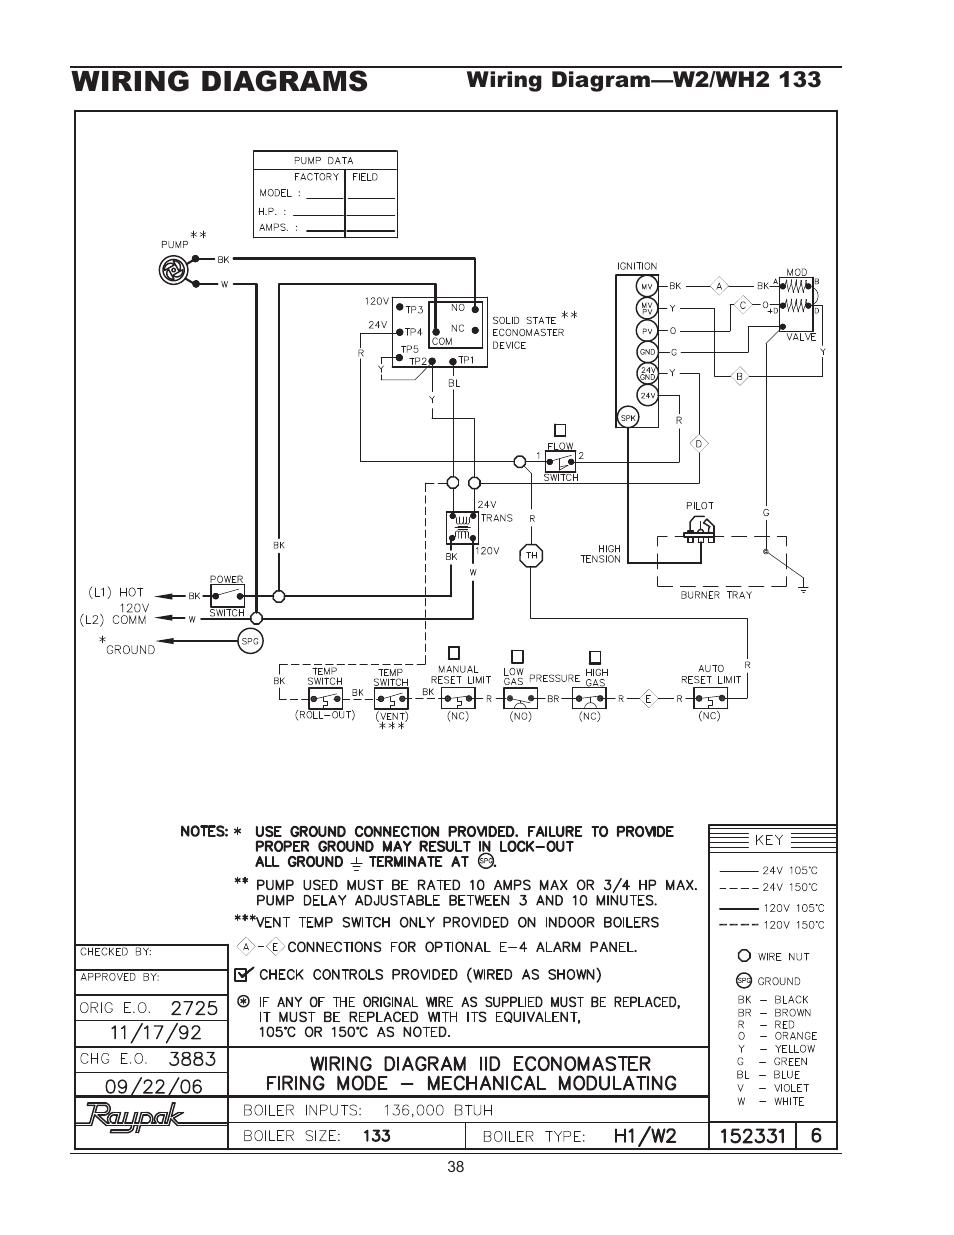 medium resolution of gun oil furnace primary control wiring diagrams home schematic diagramgun oil furnace primary control wiring diagrams